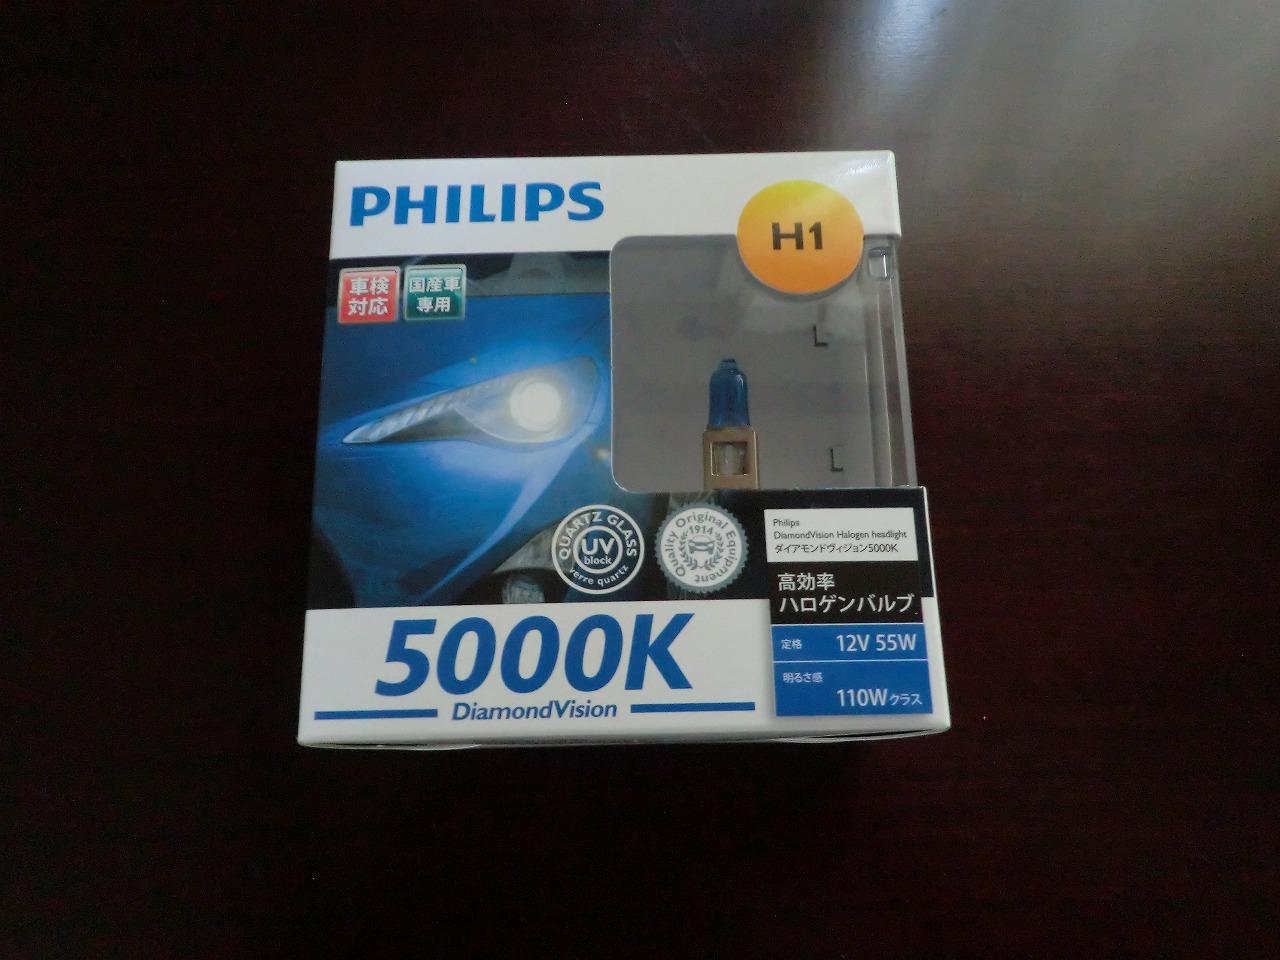 PHILIPS DiamondVision 5000K H1